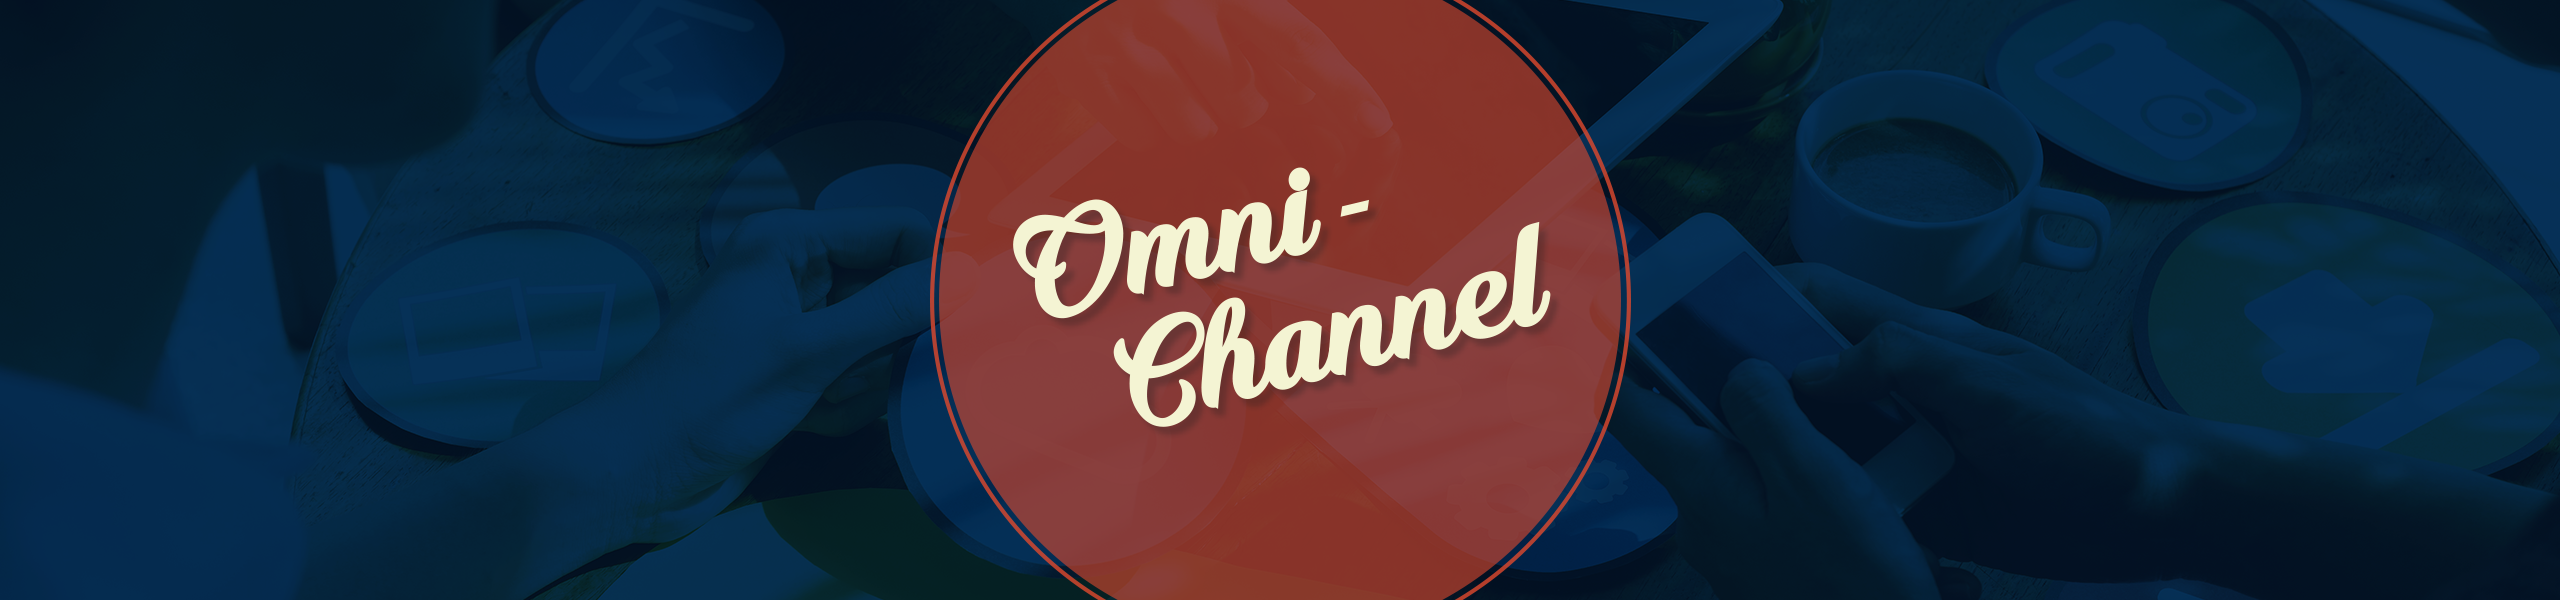 Omni-Channel Branding